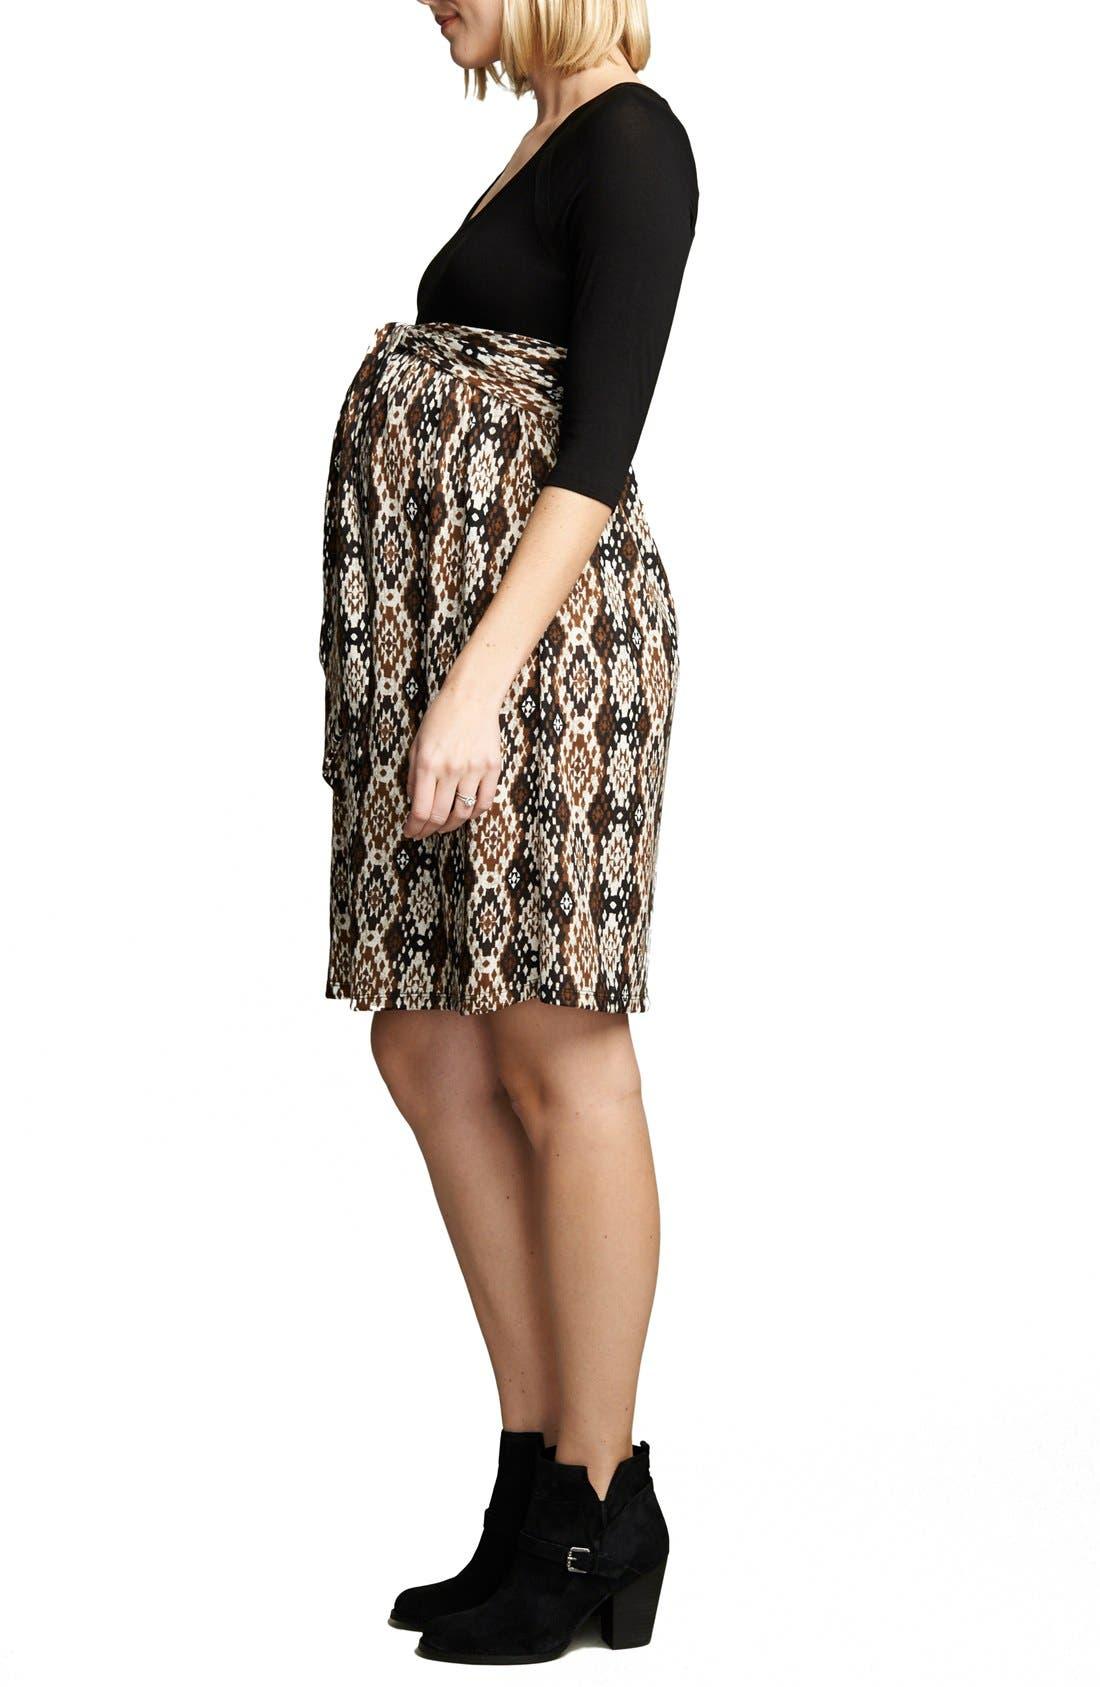 Ikat Print Tie Front Dress,                             Alternate thumbnail 3, color,                             Black/Ikat Print